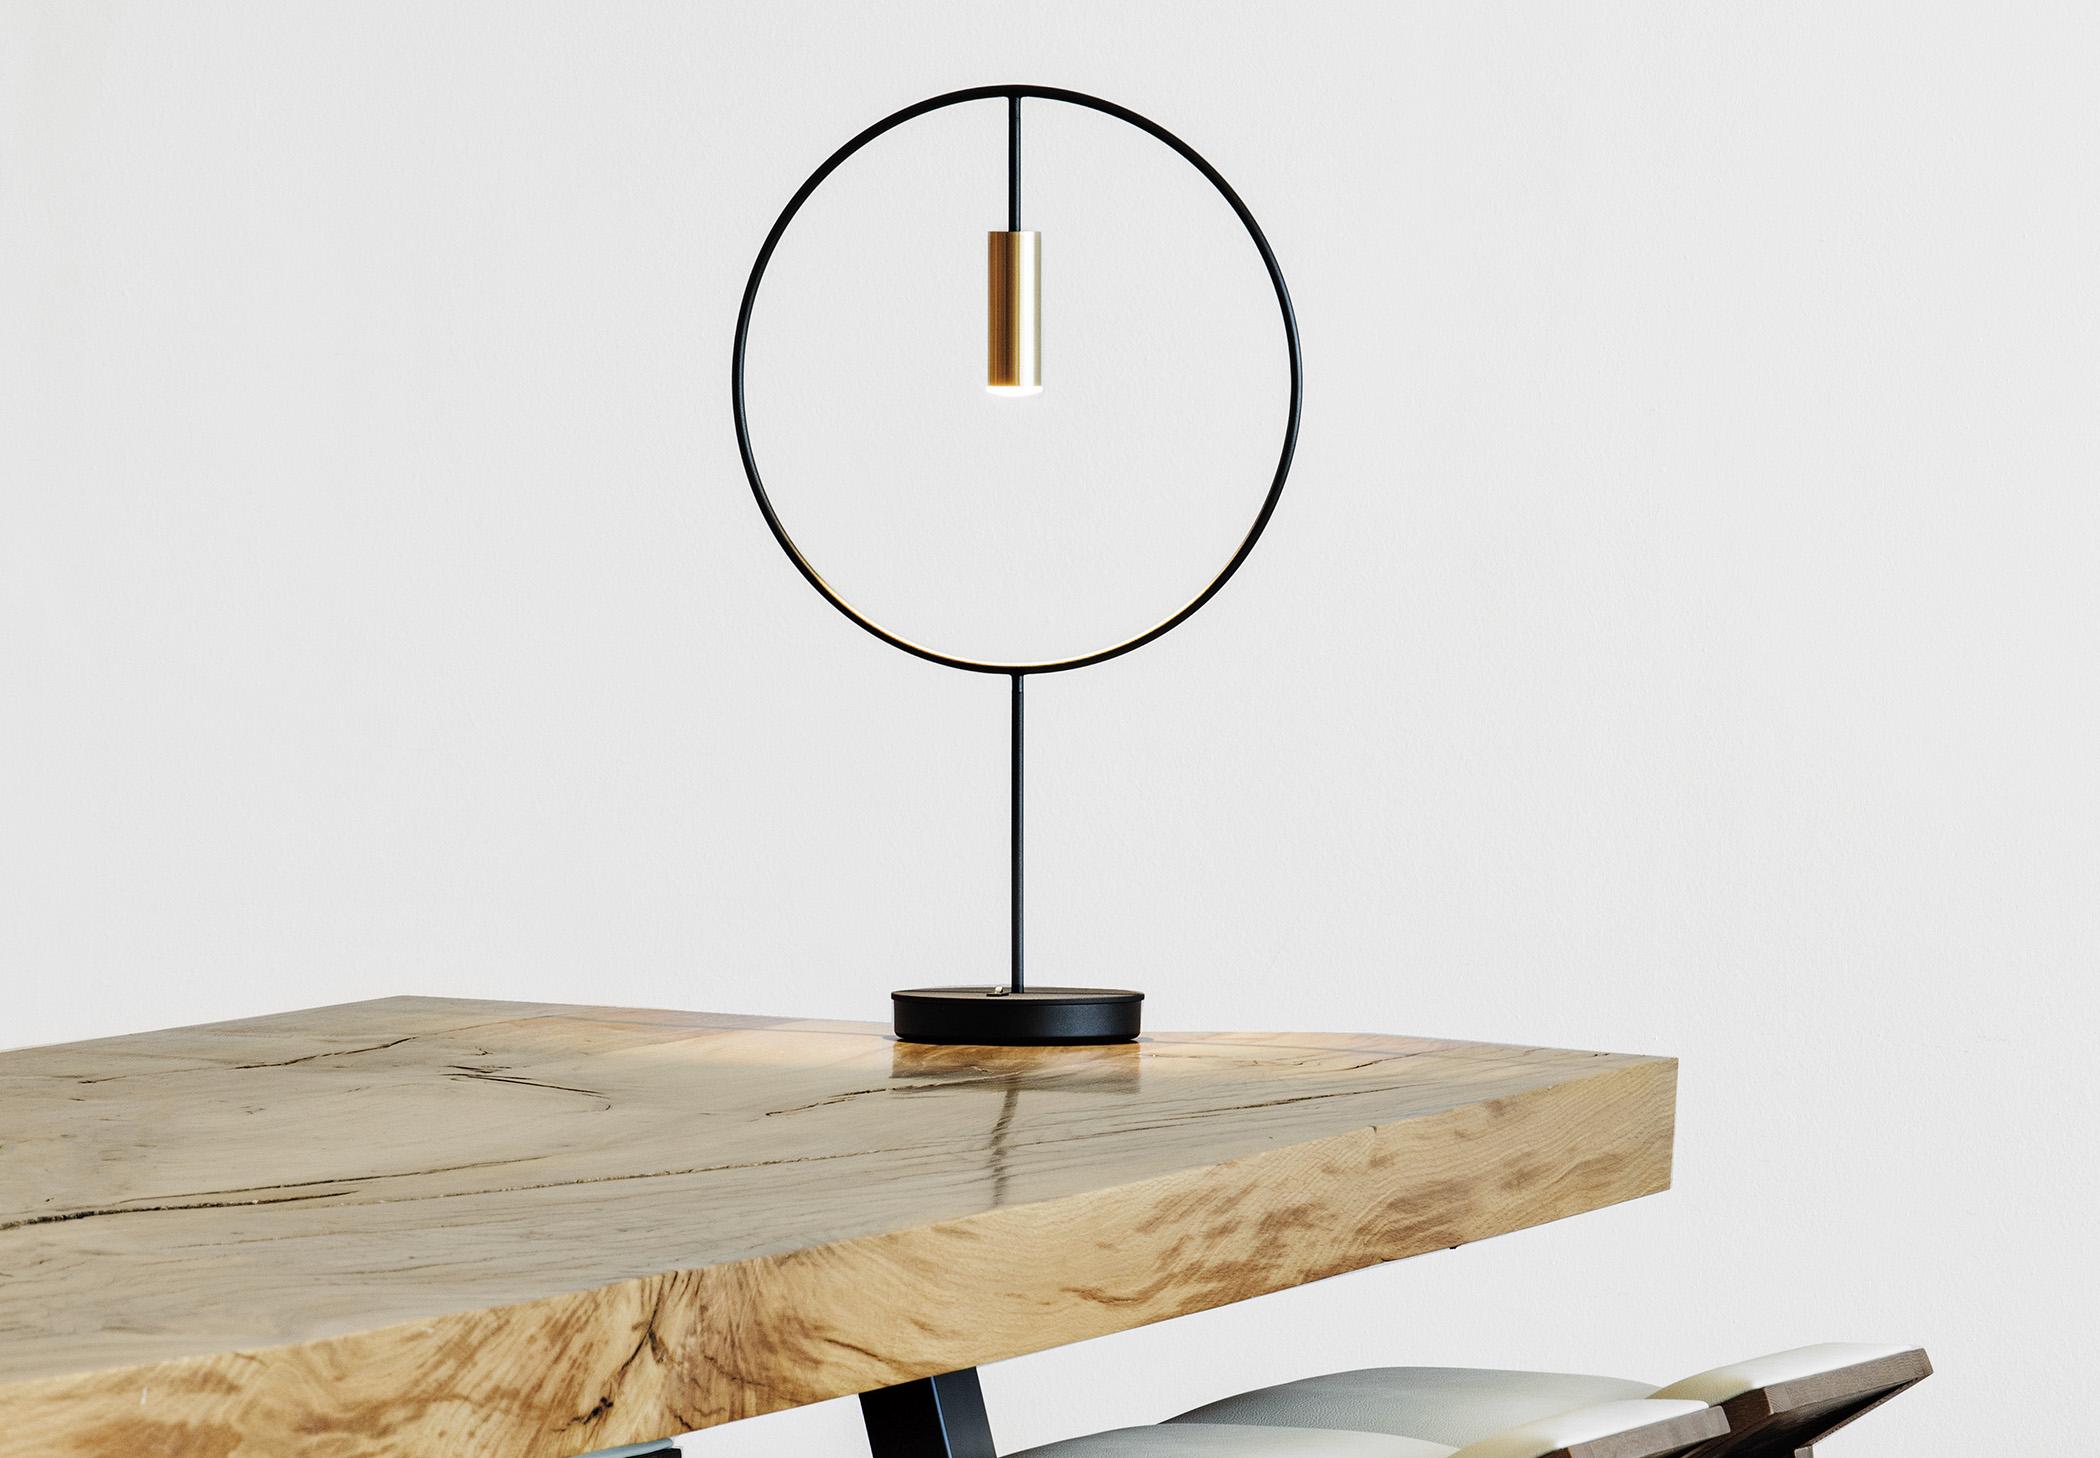 Revolta A3637 Table Lamp Estiluz Image Ambient 01